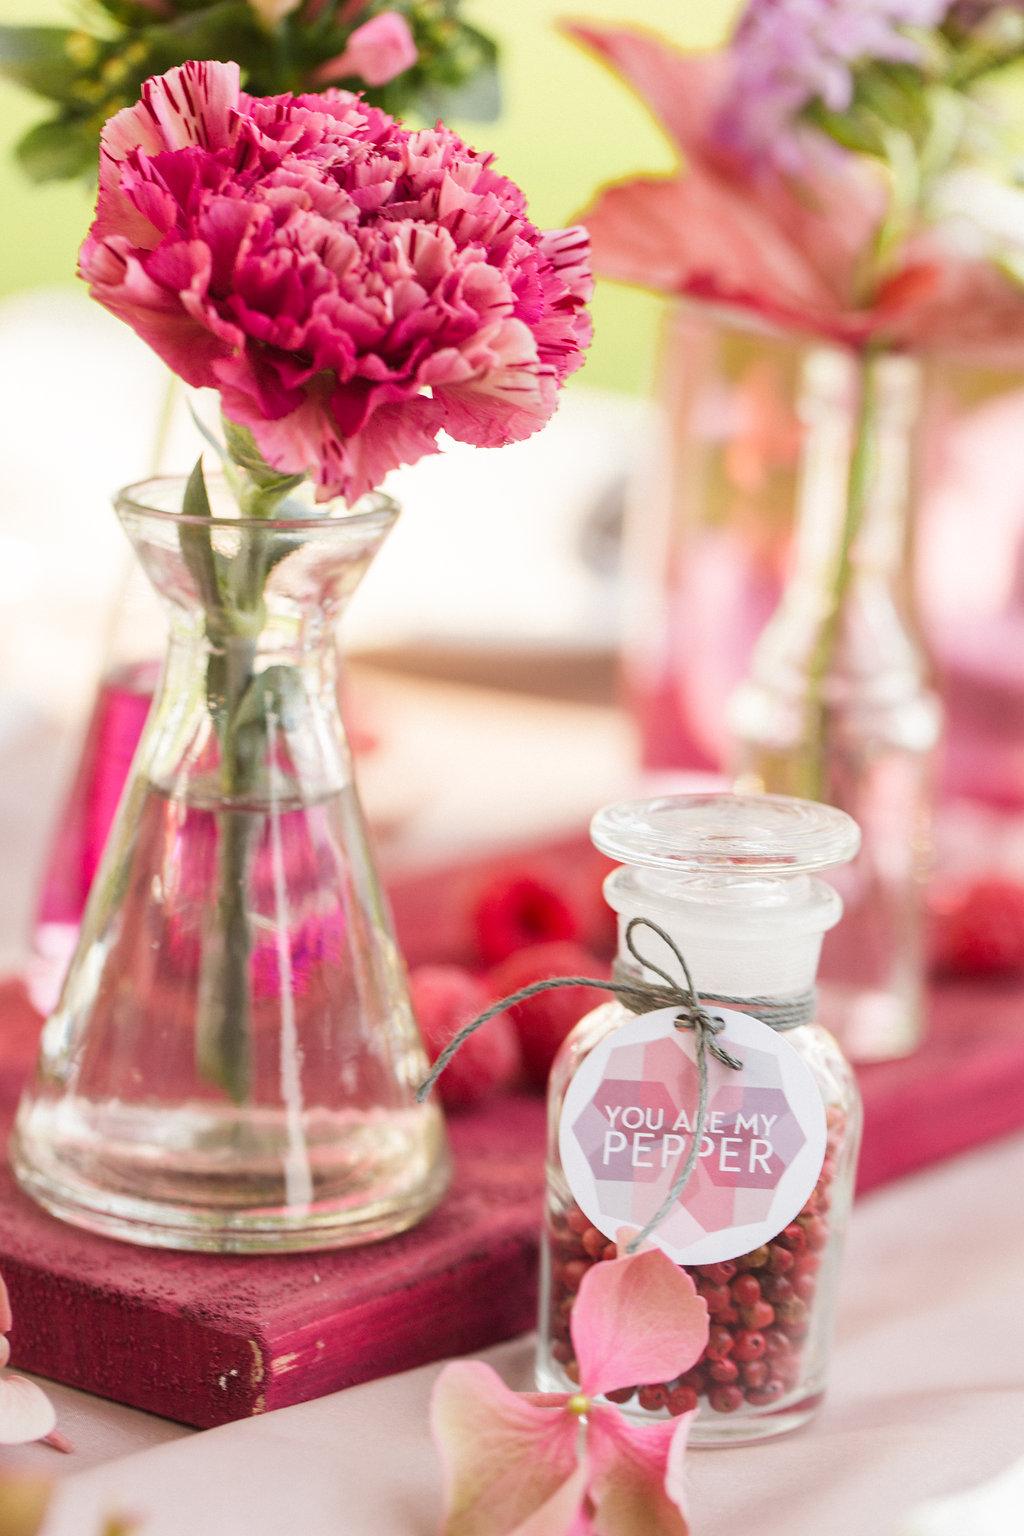 Julia_Schick_Fotografie_Gefaesse_Florale_Manufaktur_-2447